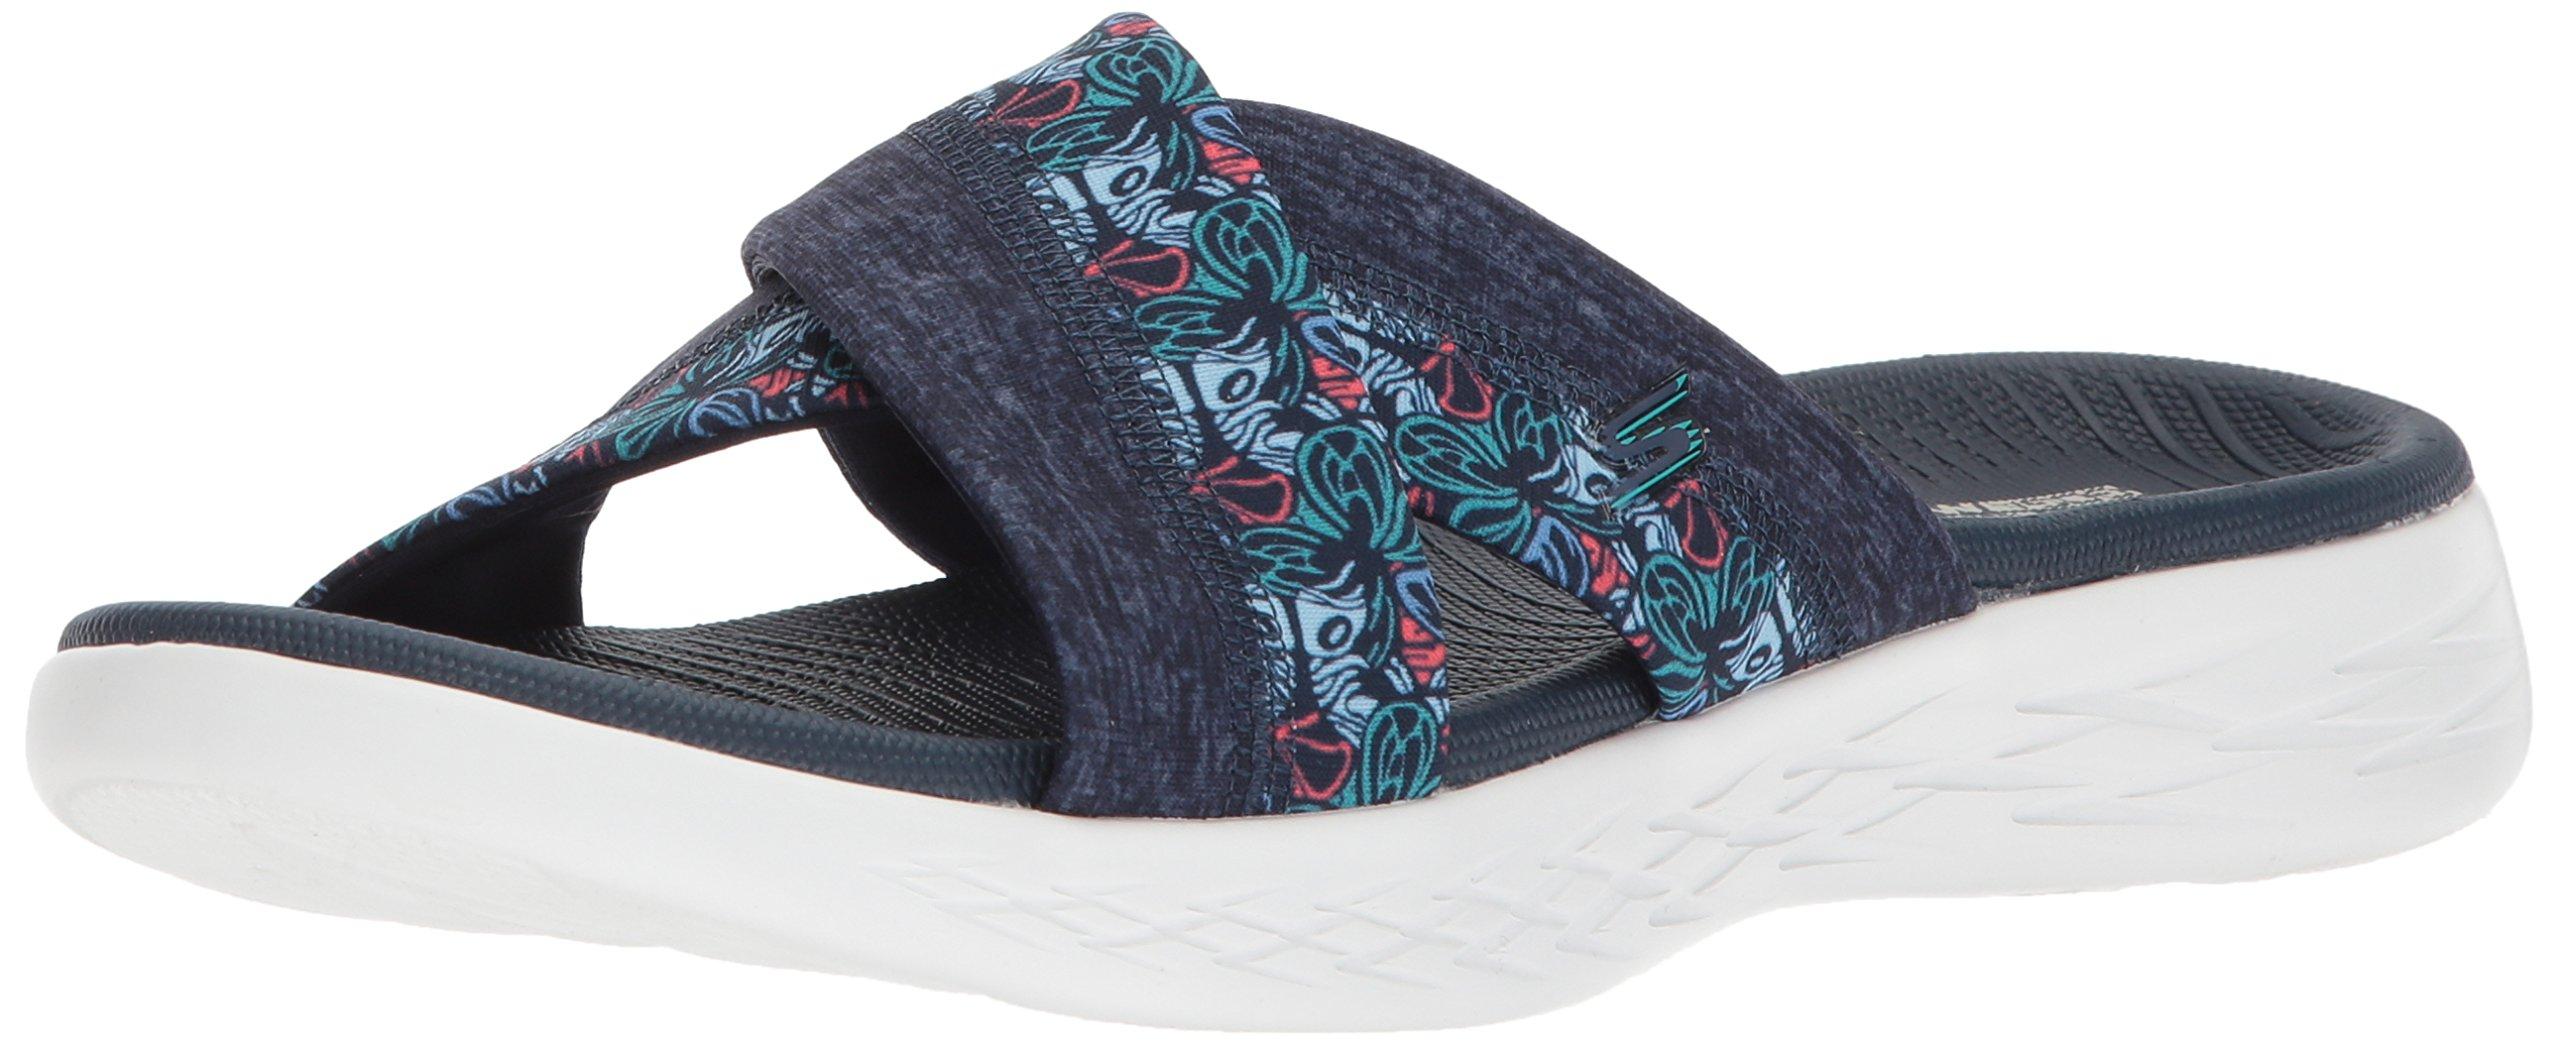 b7d86d7bd04ae Best Rated in Women s Slide Sandals   Helpful Customer Reviews ...